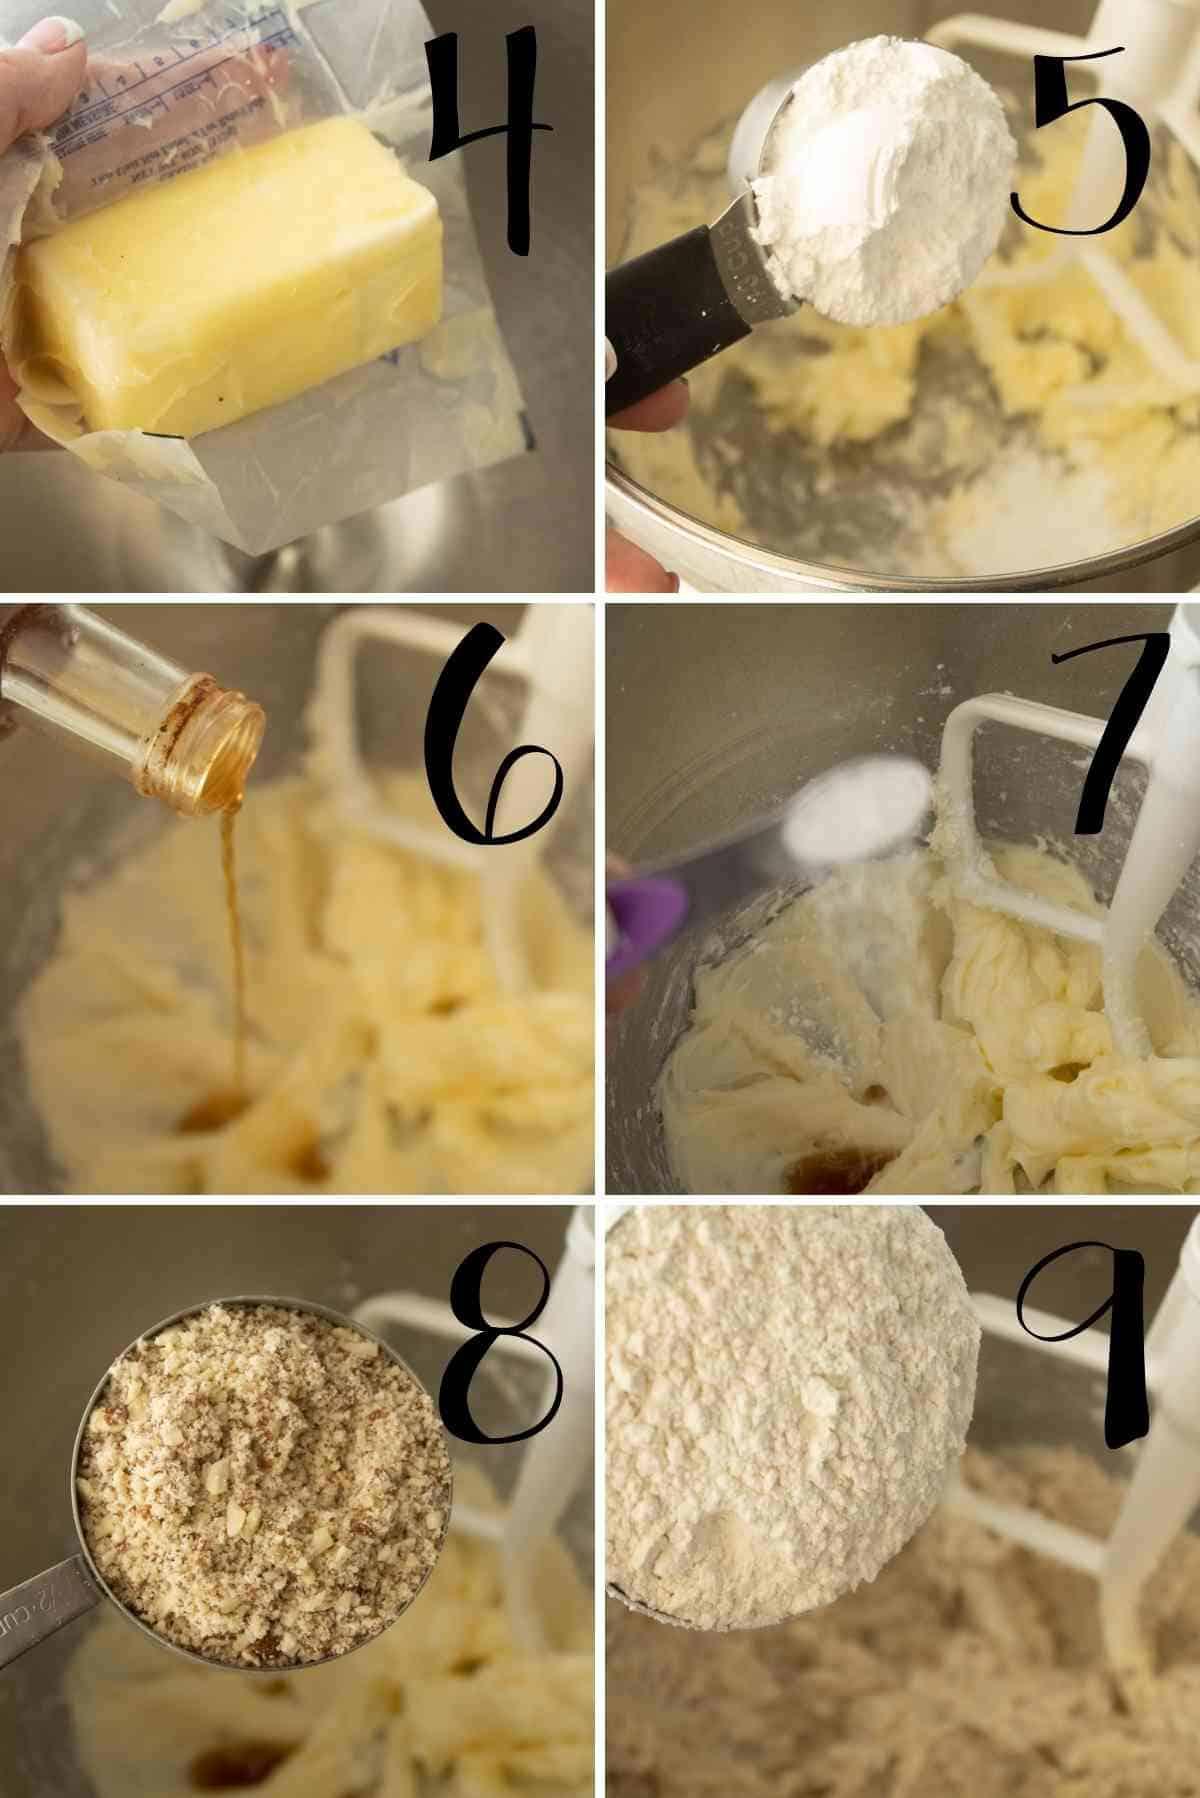 Mix butter, powdered sugar, vanilla, salt, ground almonds and flour into a stiff shortbread dough.